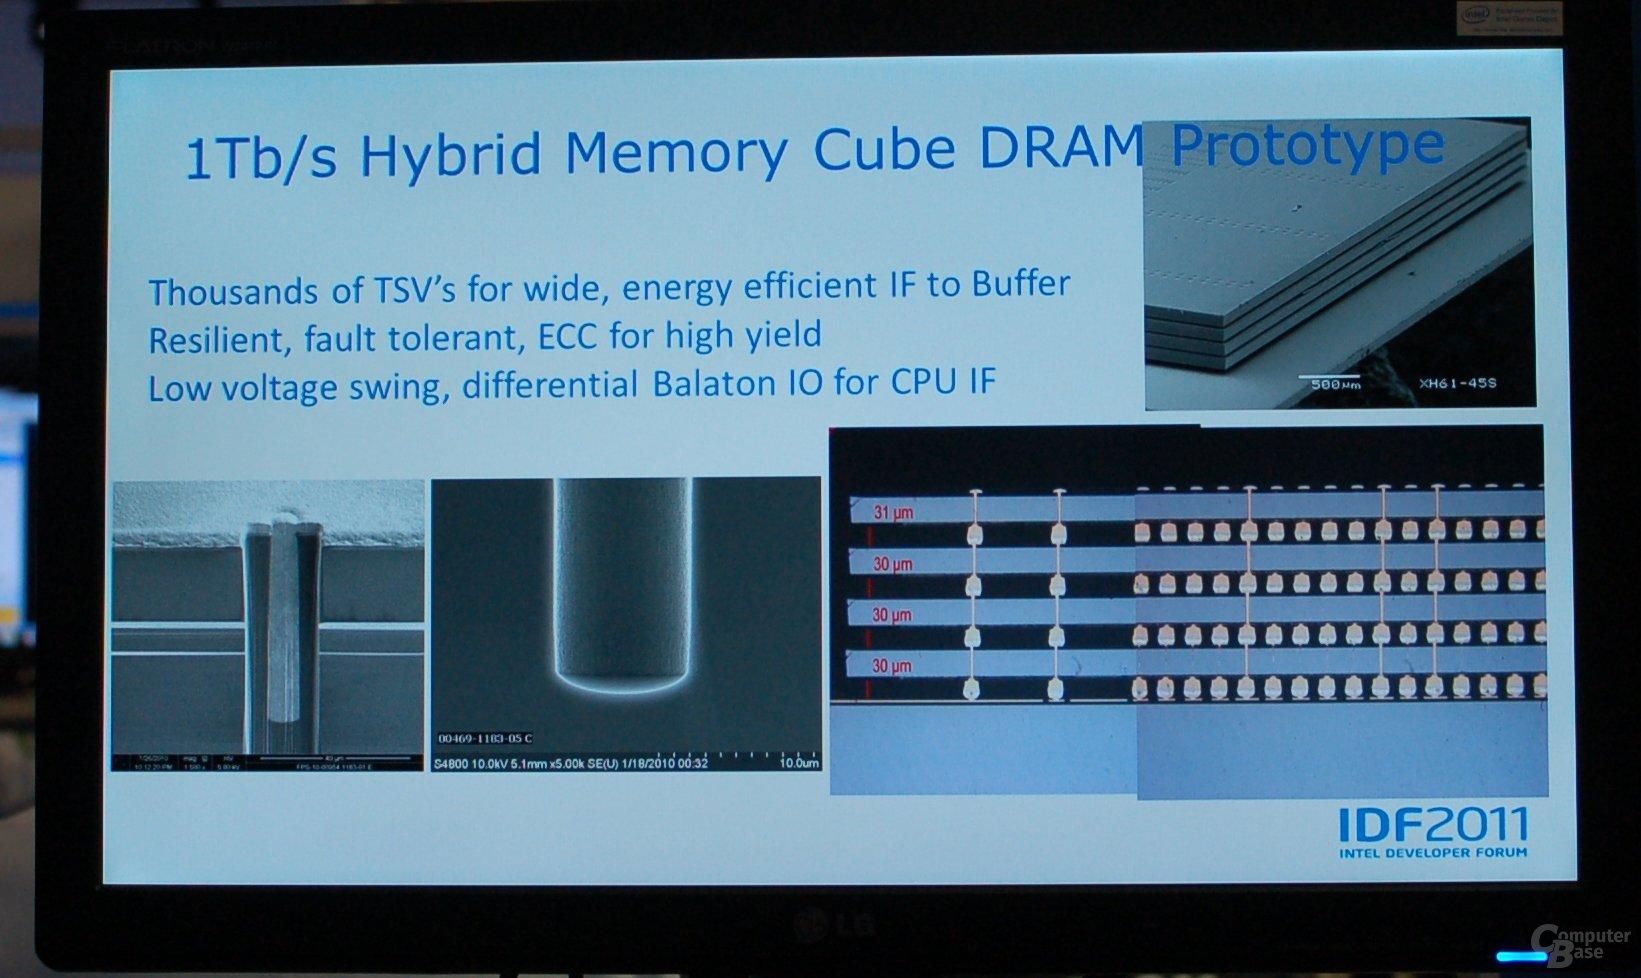 Micron Hybrid Memory Cube DRAM